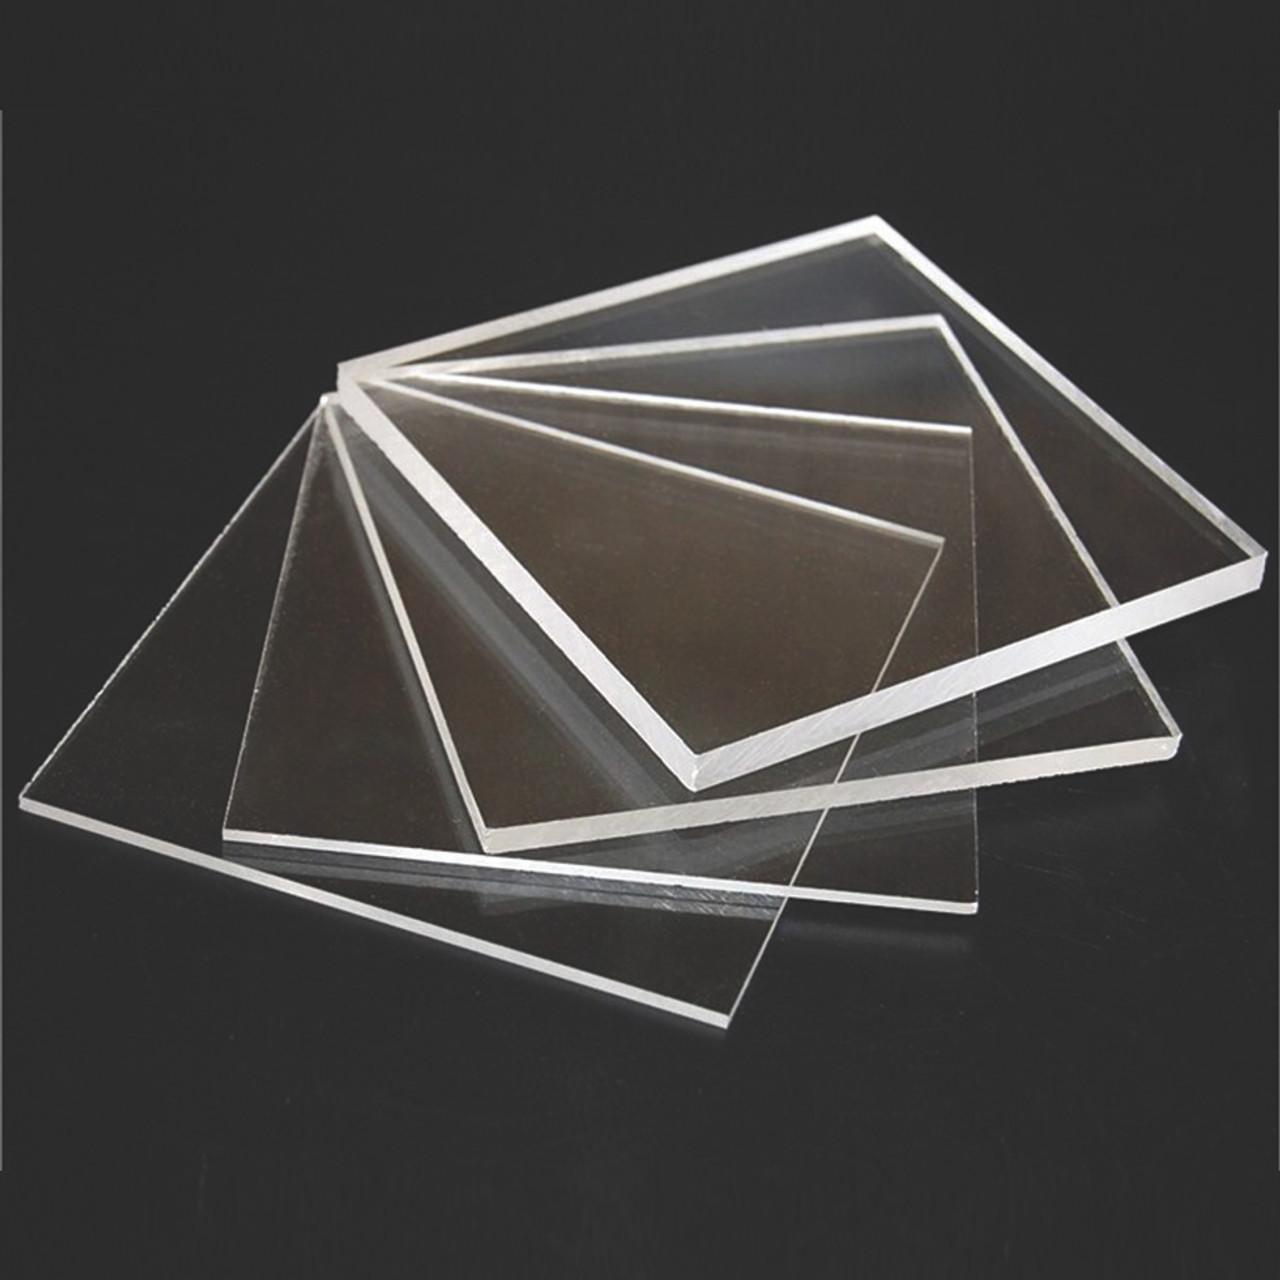 "4' x 8' x 1"" Thick Clear Acrylic Sheet, Plexiglas"